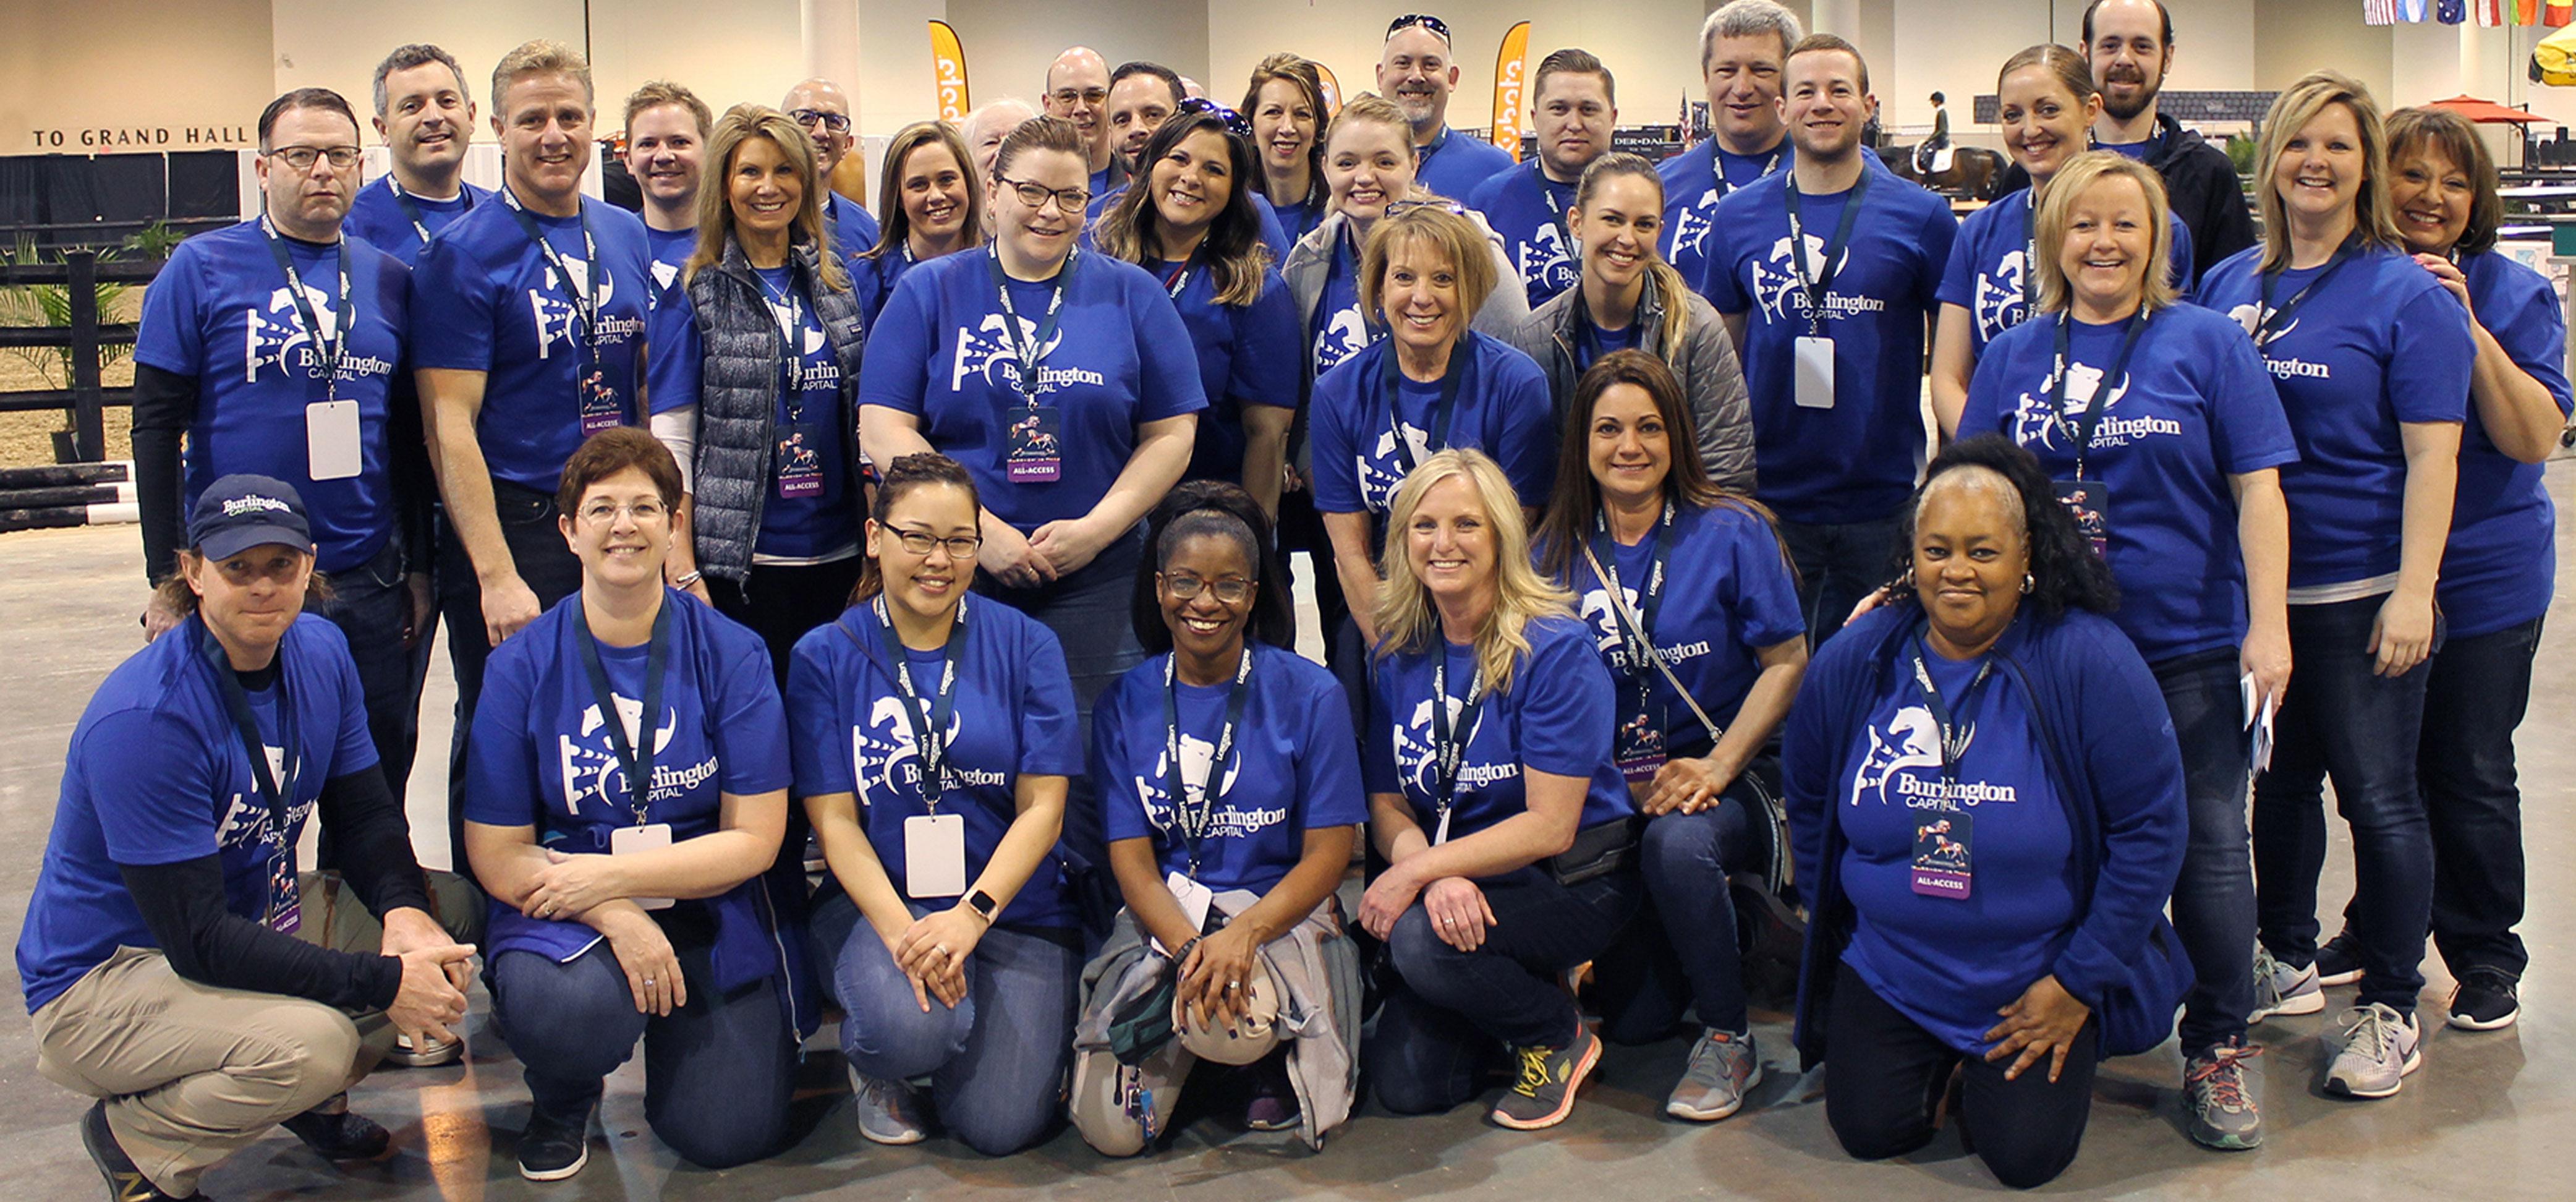 Burlington Capital LLC spends the day volunteering!